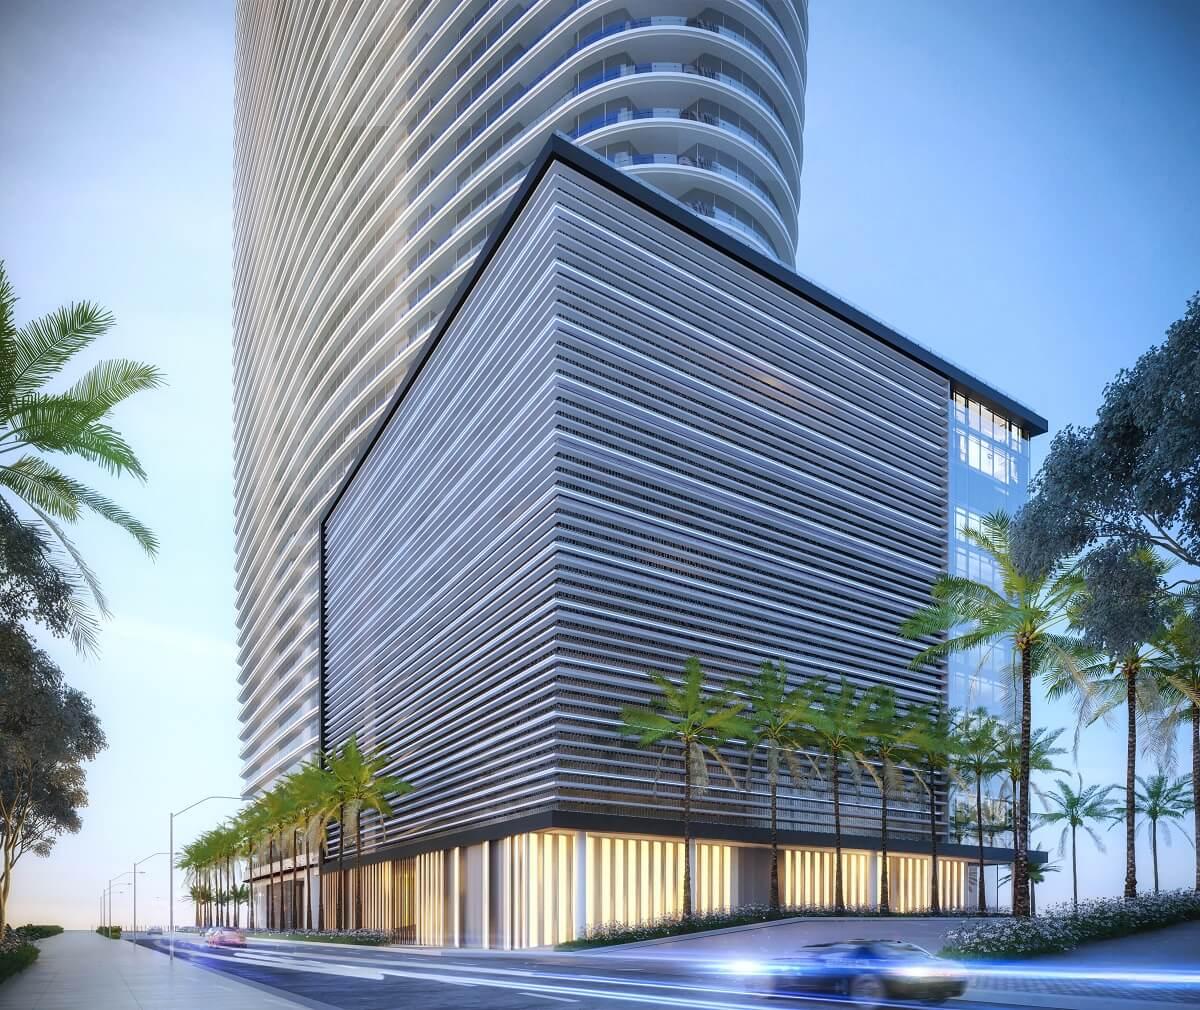 aston-martin-residences-at-300-biscayne-boulevard-12-jpg-3.jpg